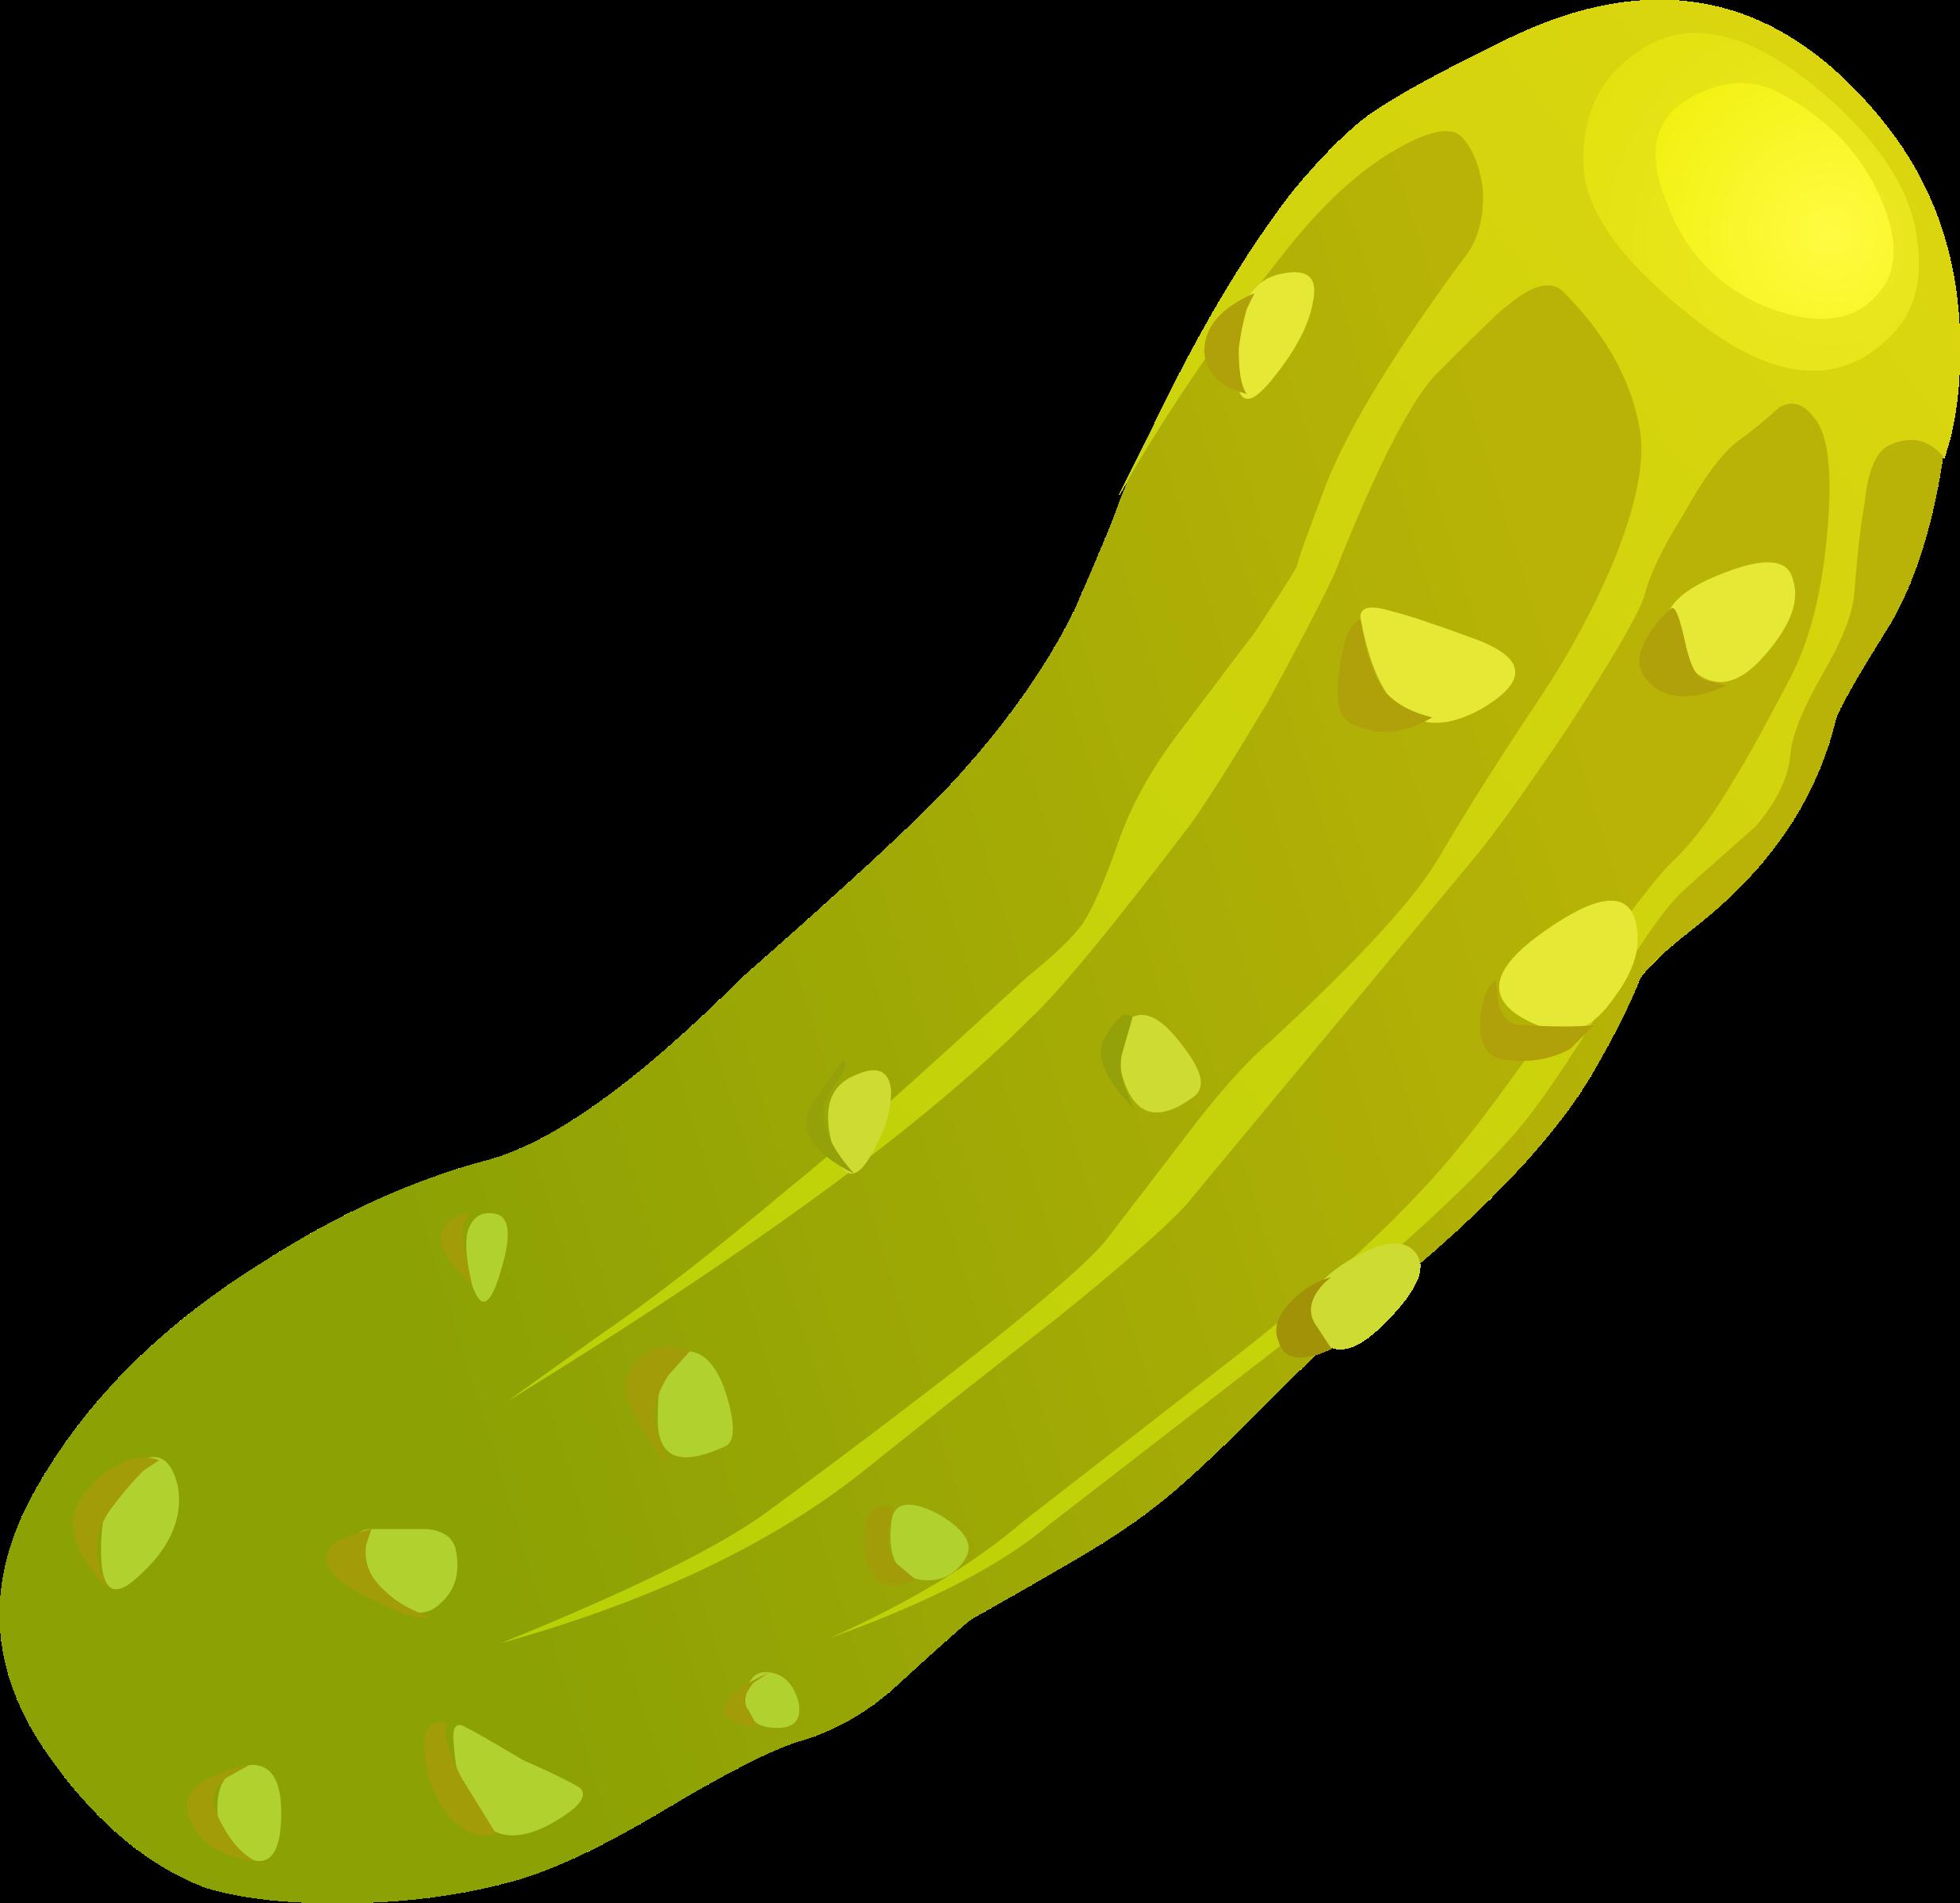 Pickle Clip Art